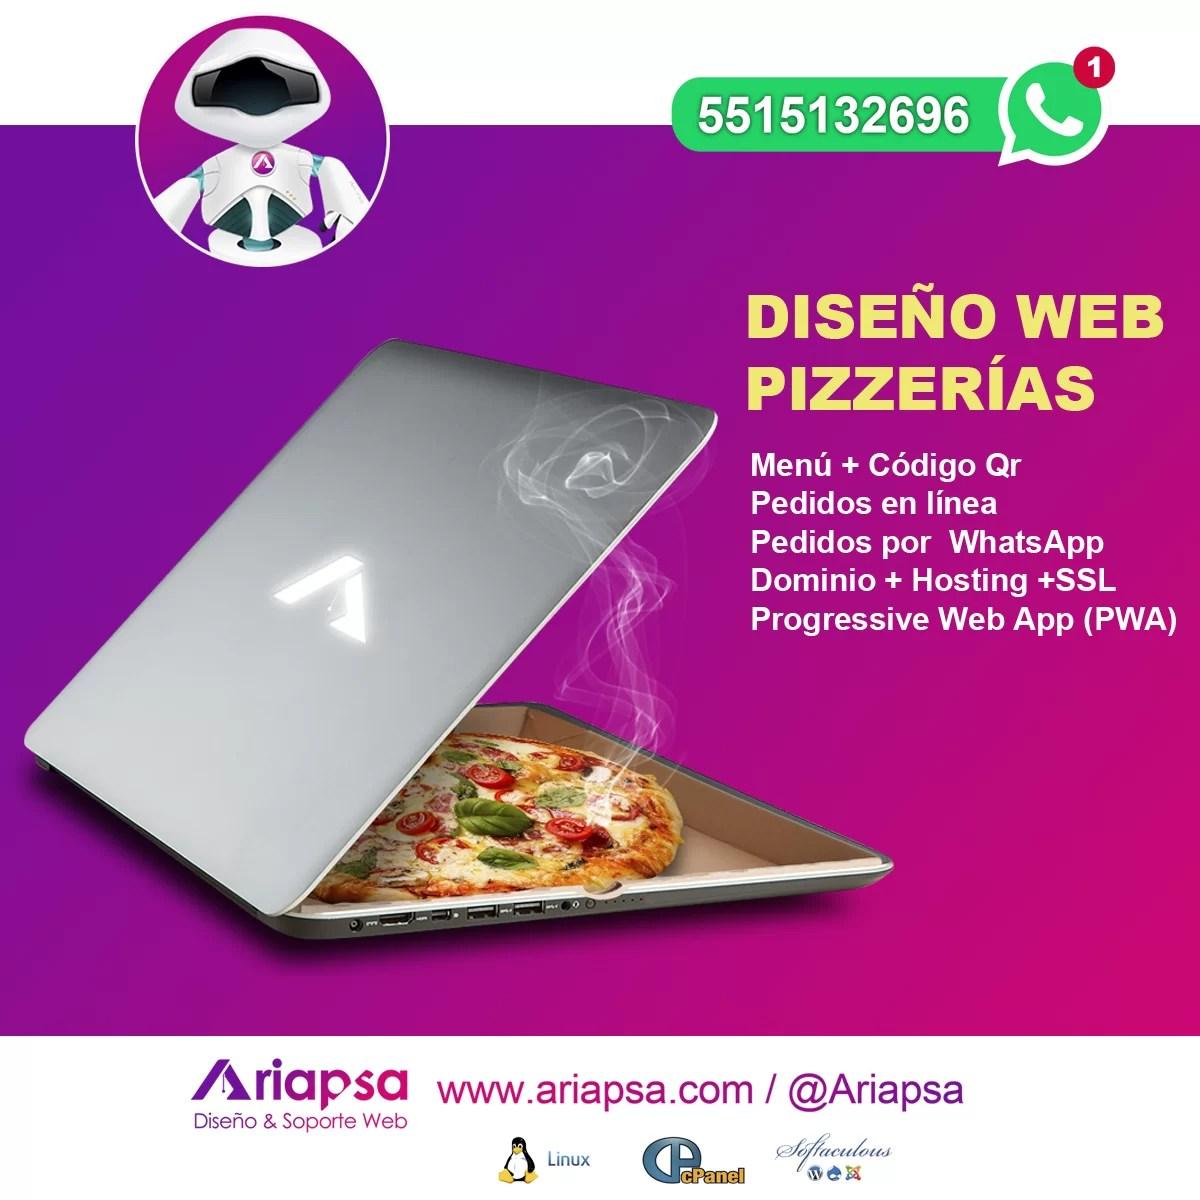 Diseño web pizzerias Ariapsa México 2